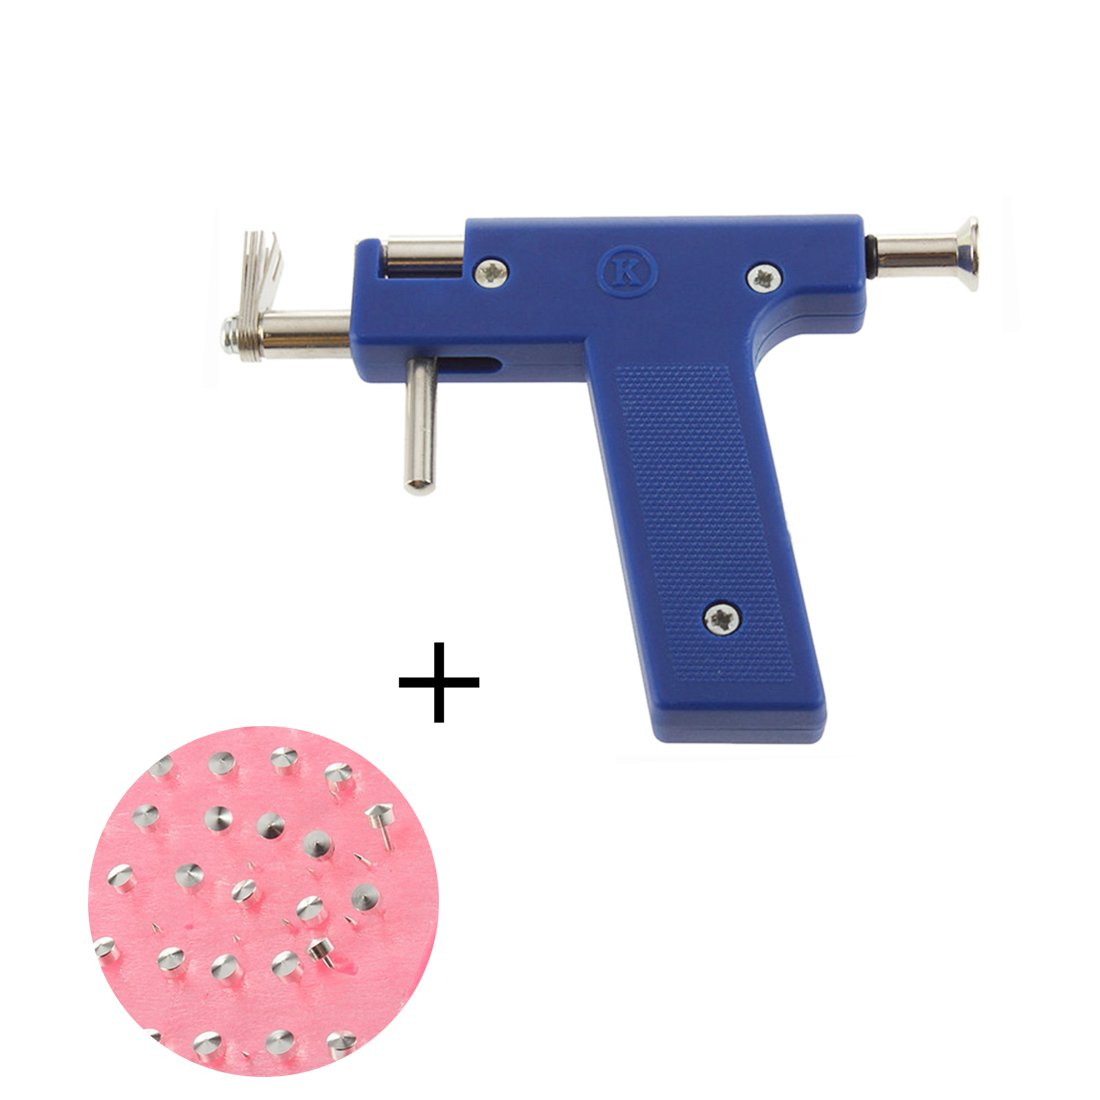 Professional Ear Piercing Gun Tool Set + 98pcs Ear Studs Steel Ear Nose Navel Body Piercing Gun Unit Tool Kit by ruipuplr (Image #1)